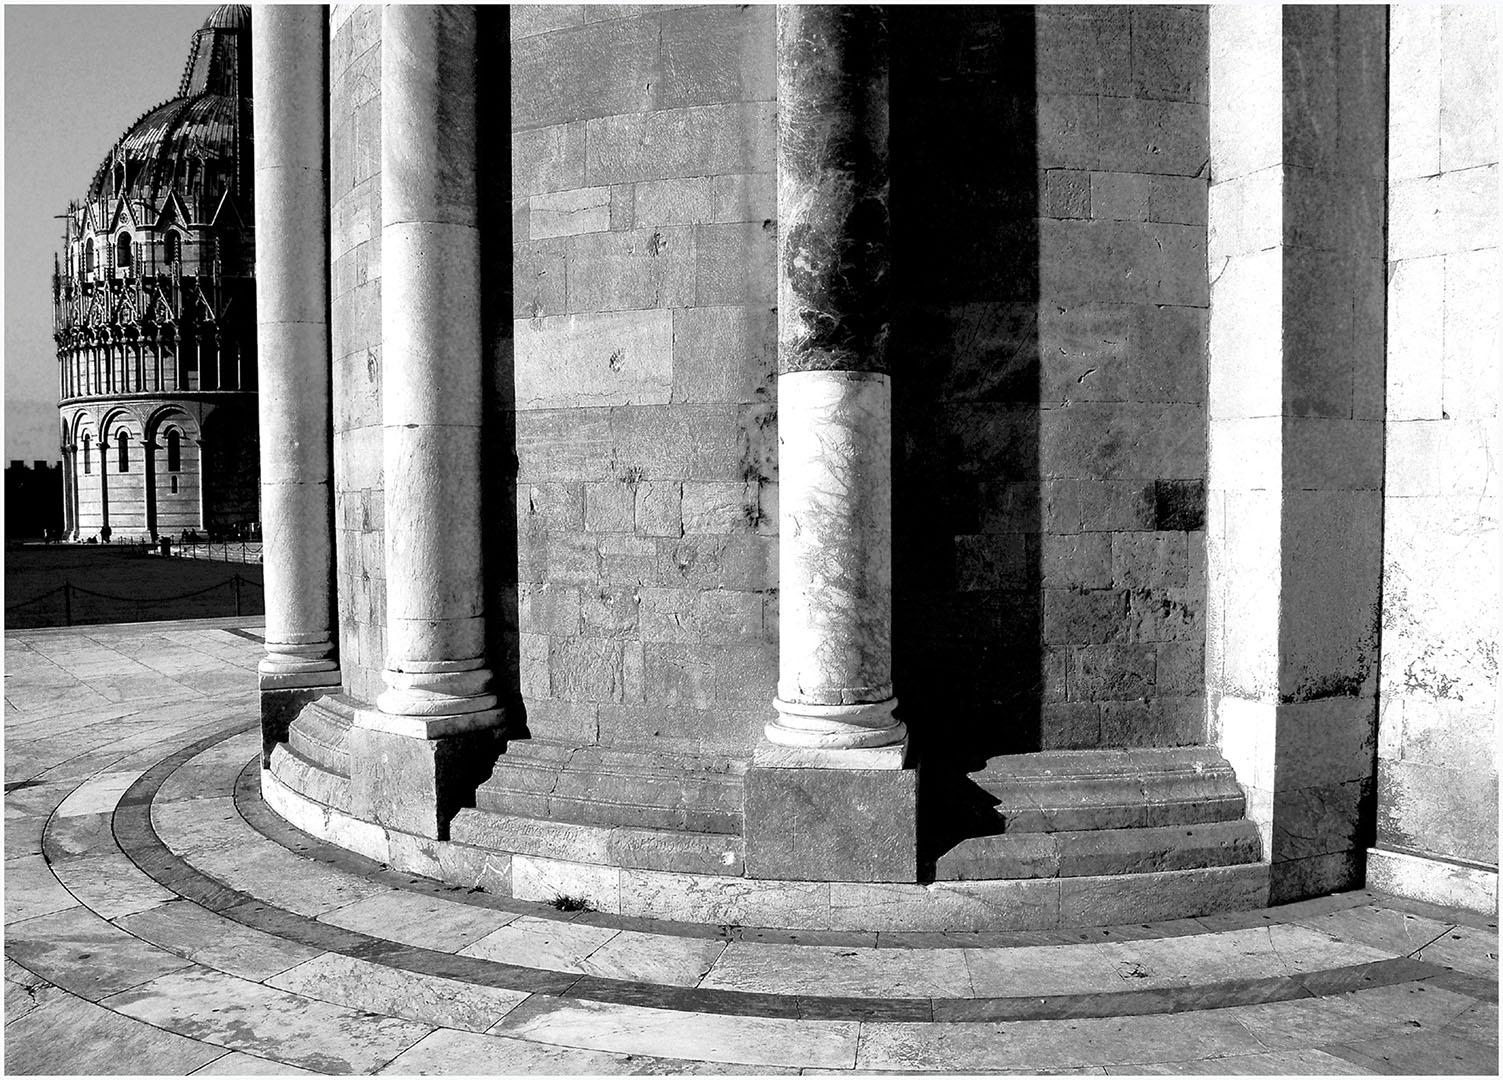 Pisa-Piazza_dei_Miracoli_063_I08-10.68